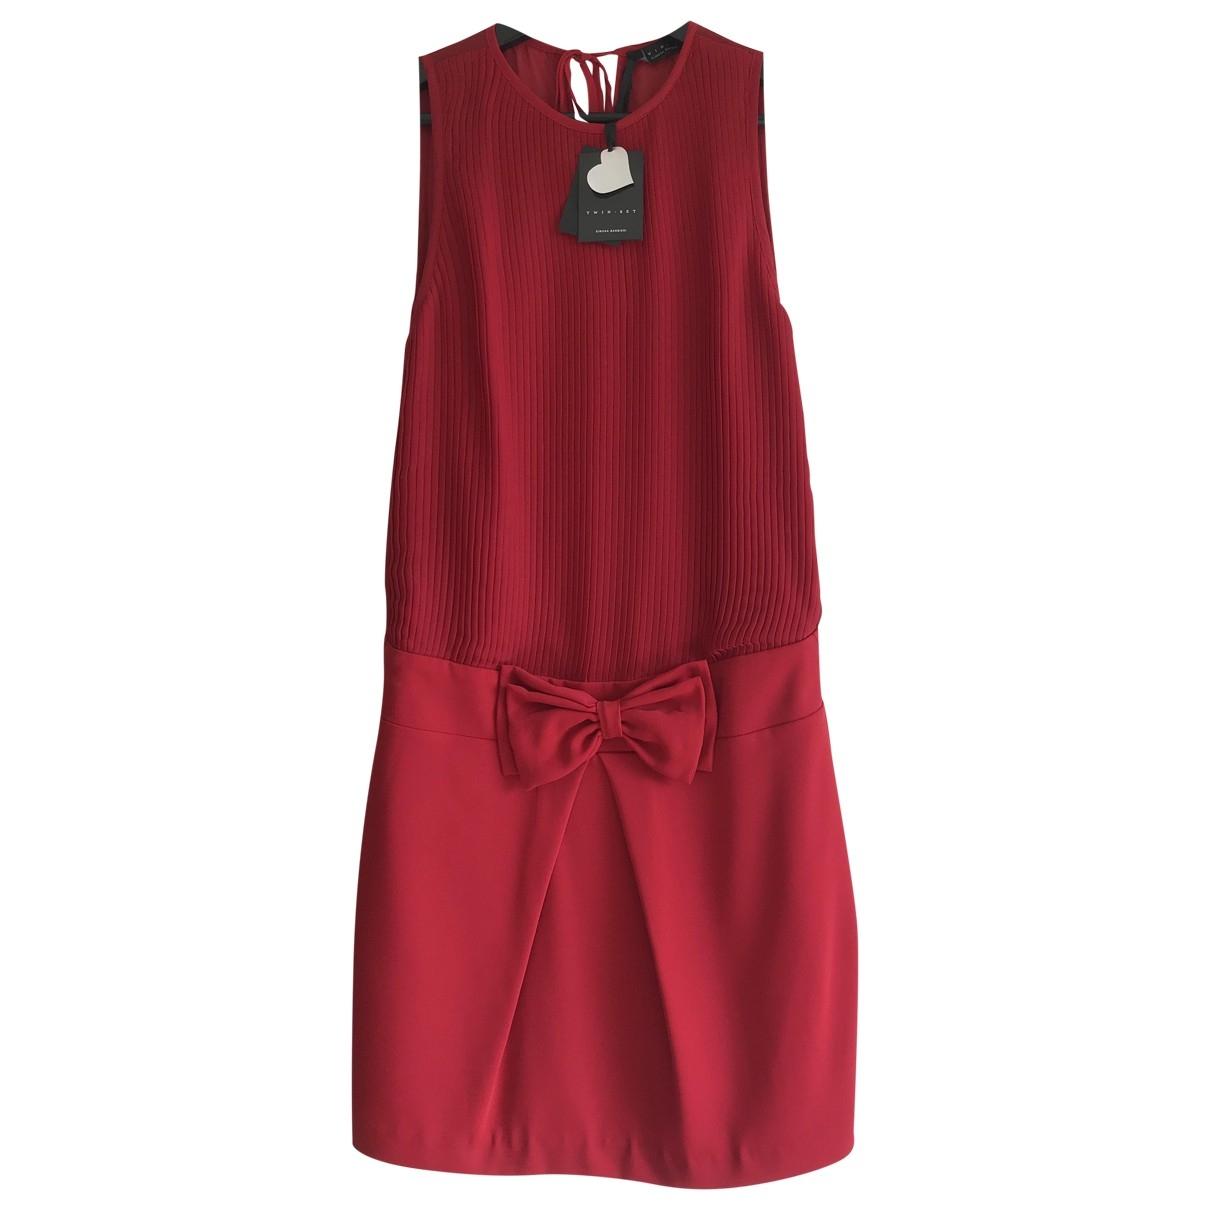 Twin Set \N Red dress for Women XS International